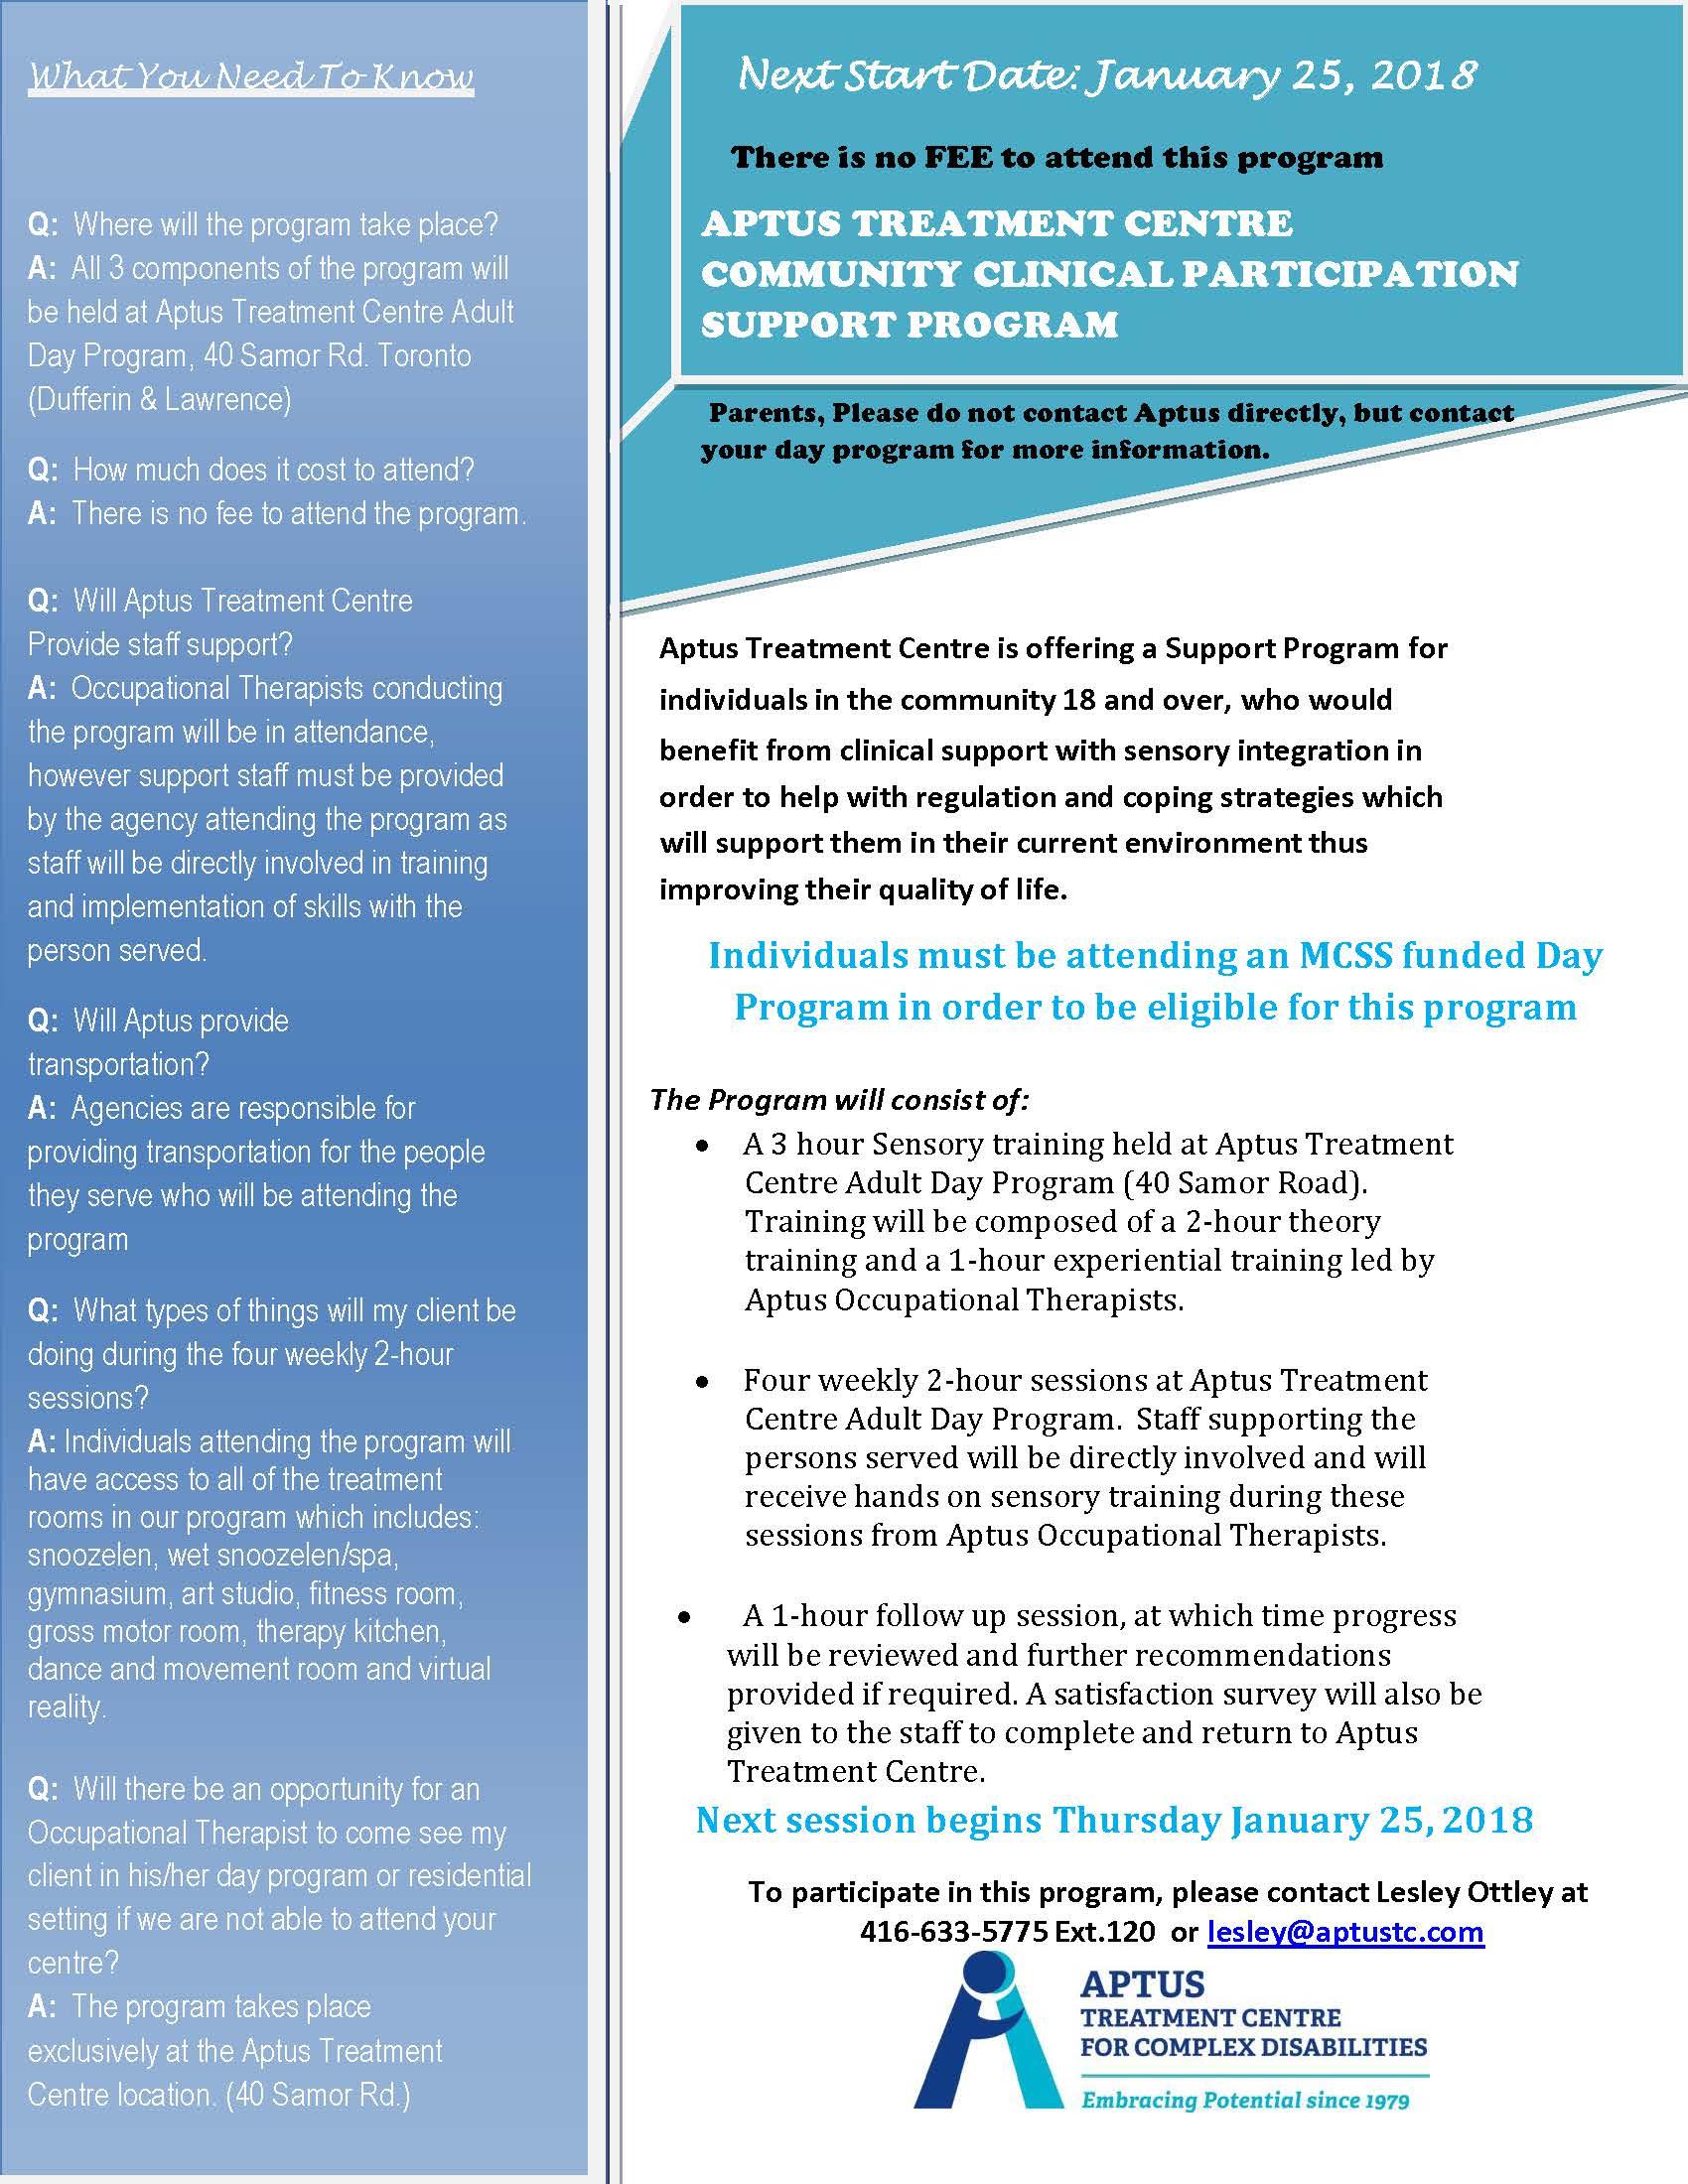 community treatment program Comprehensive school and community treatment (csct) comprehensive school and community treatment is a comprehensive planned course of community.